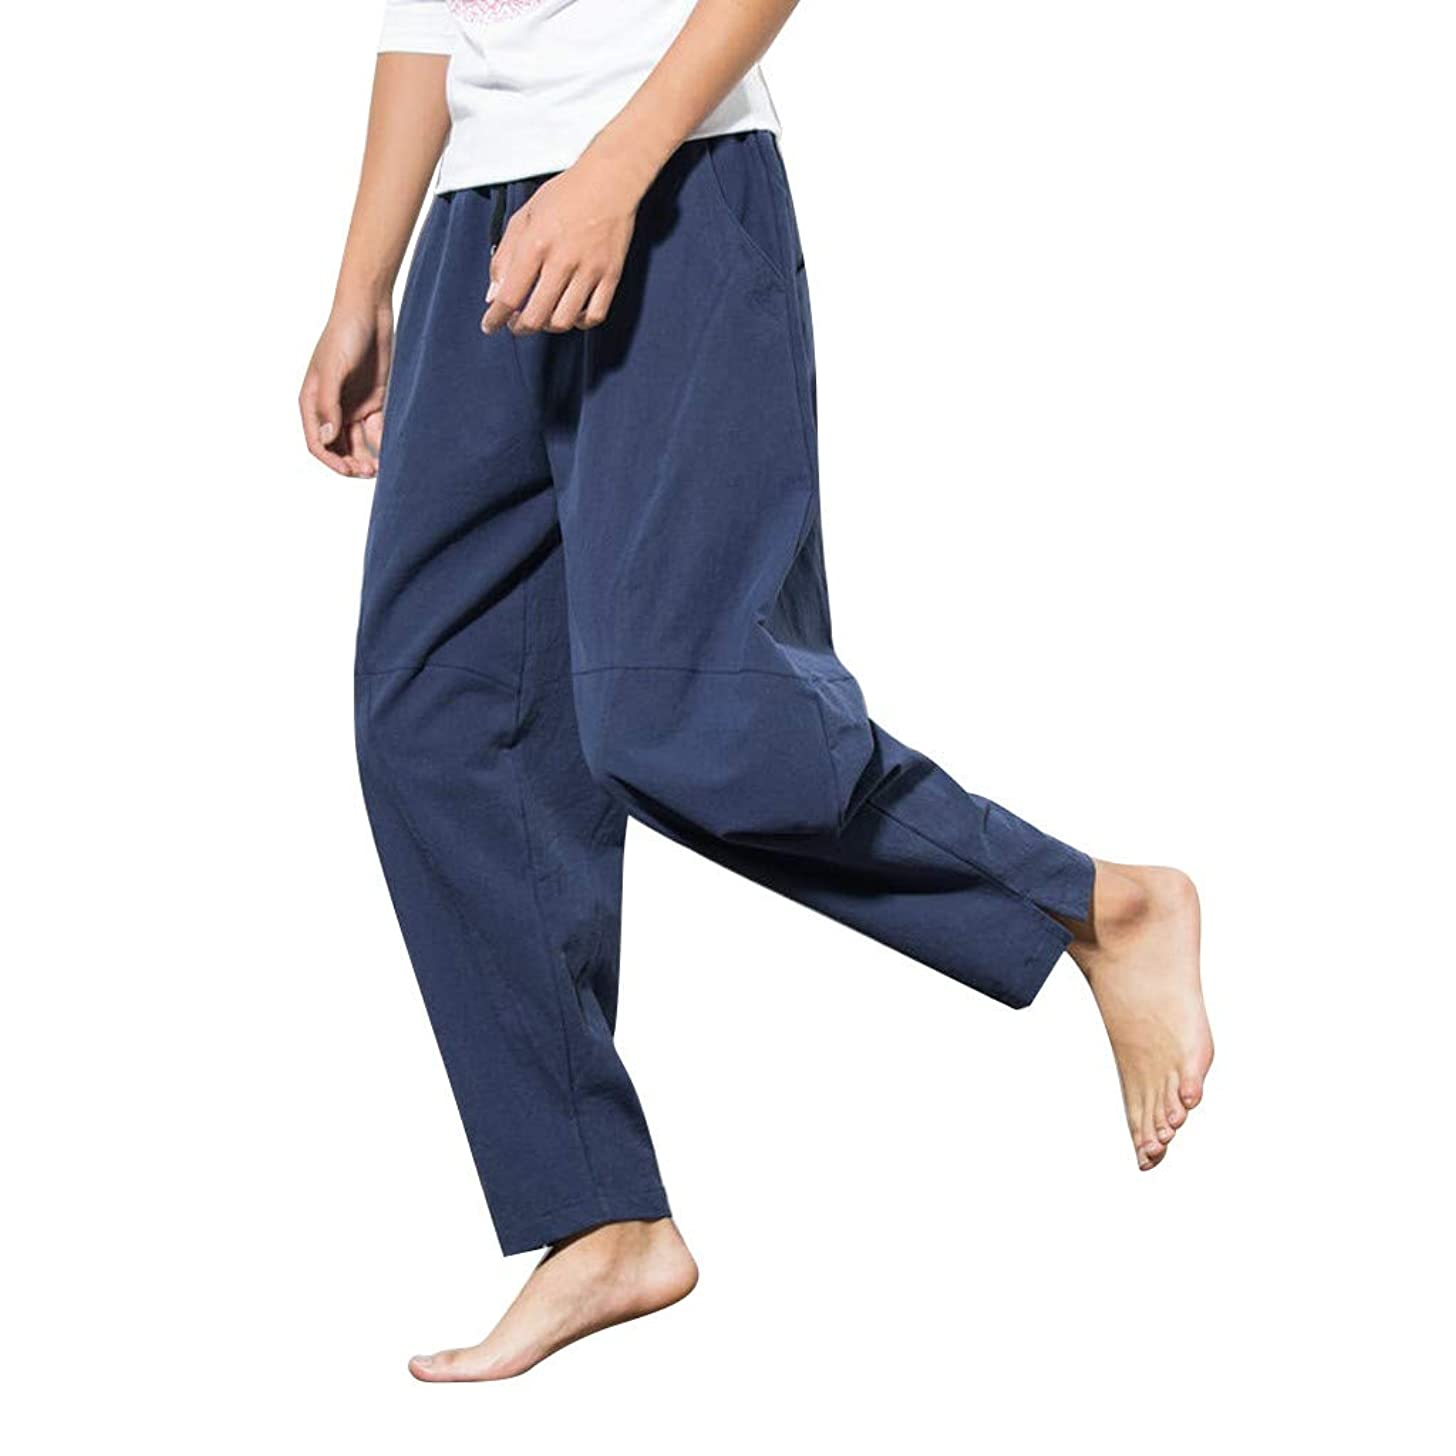 Sunyastor Men's Casual Pants, Drawstring Loose Baggy Linen Capri Harem Pants Crop Yoga Wide-Legged Pants with Pockets